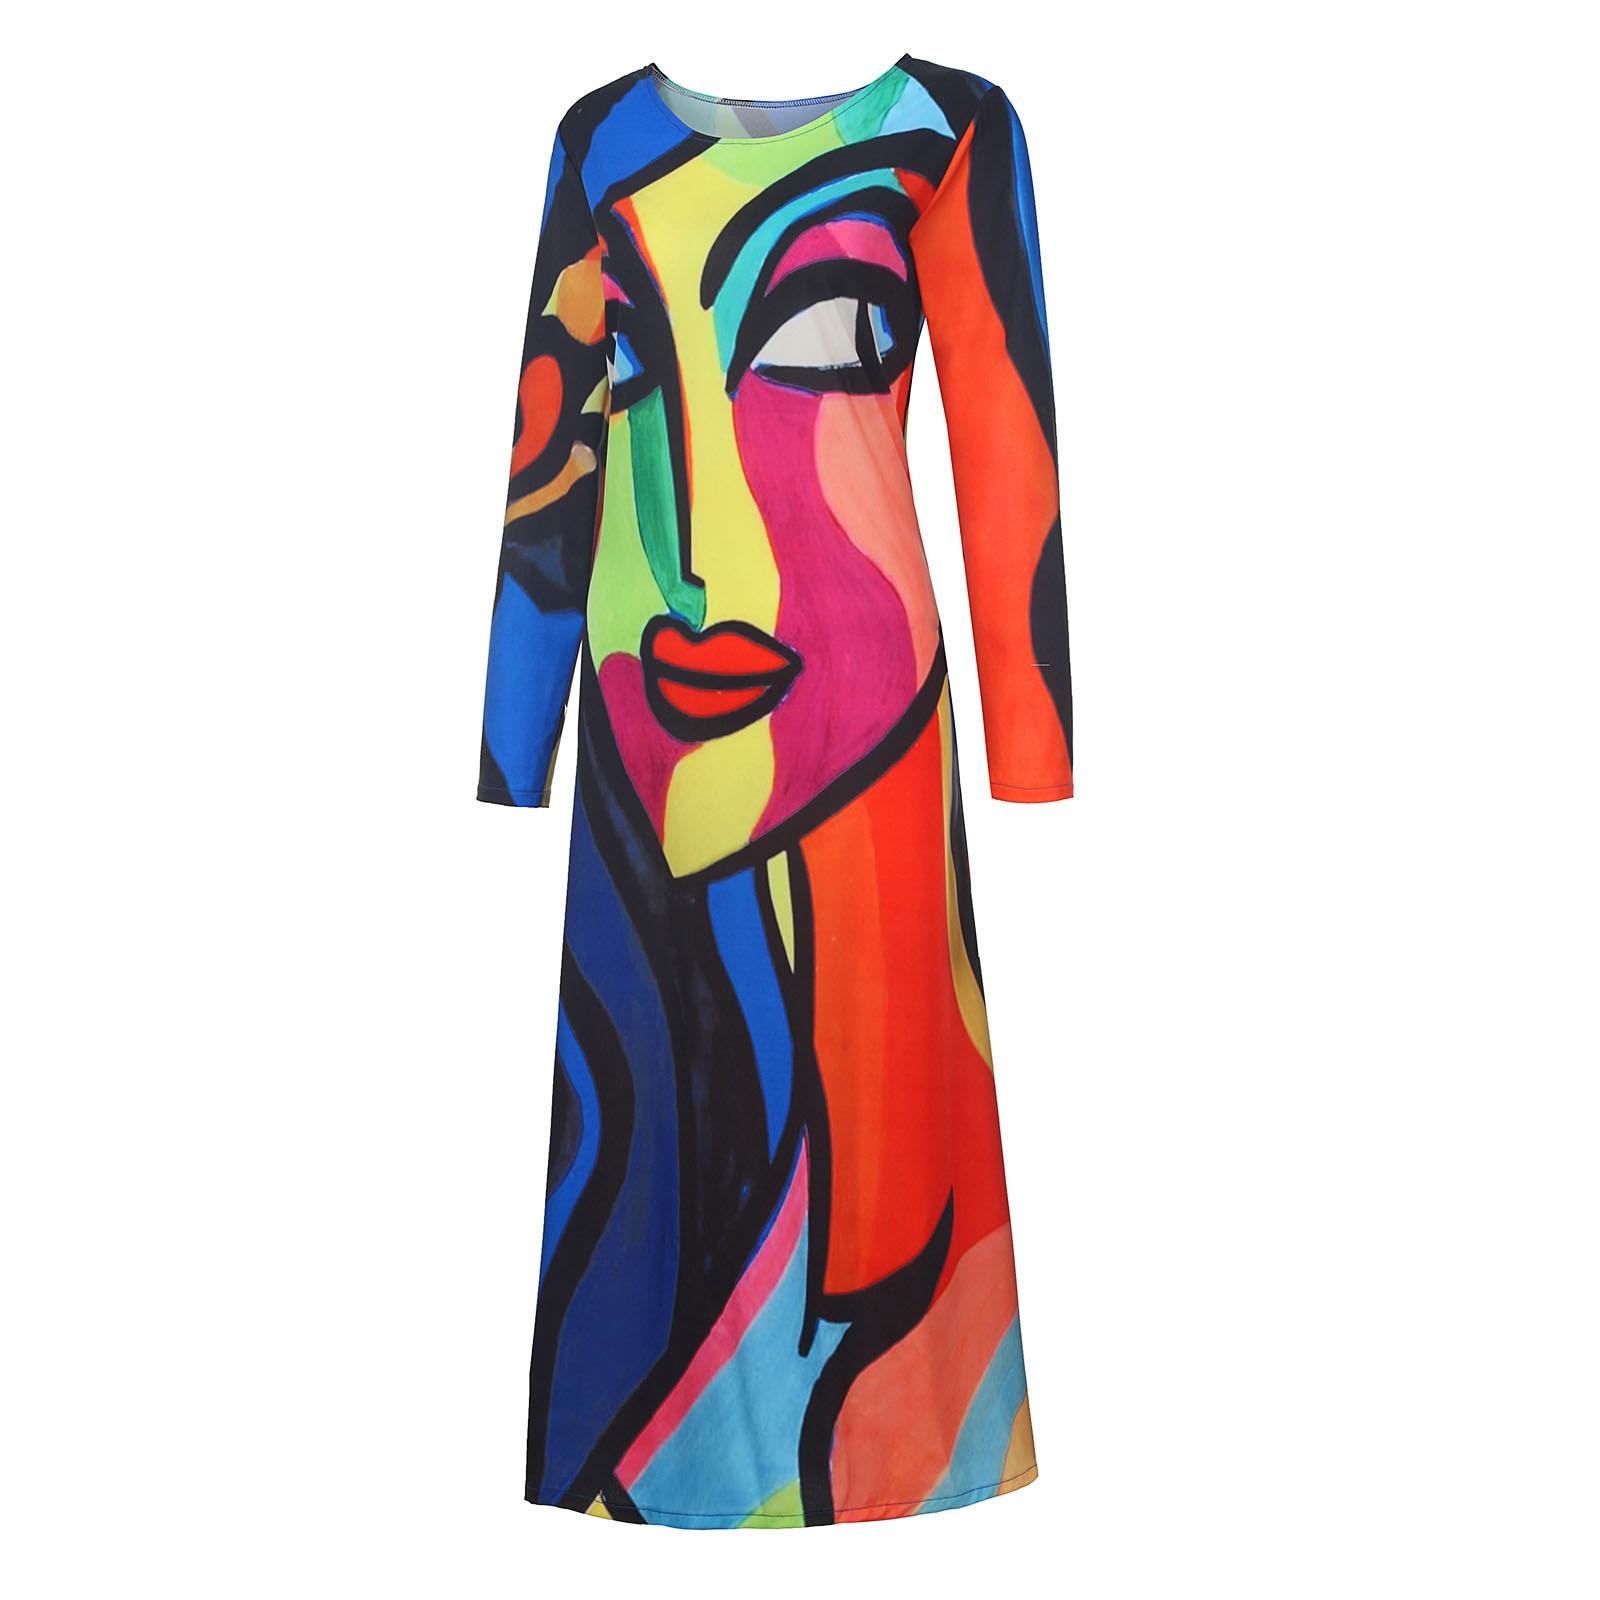 Elegant Abstract Girl Cartoon Printed Dress Women Vintage V Neck Long Party Dresses Casual Short Sleeve